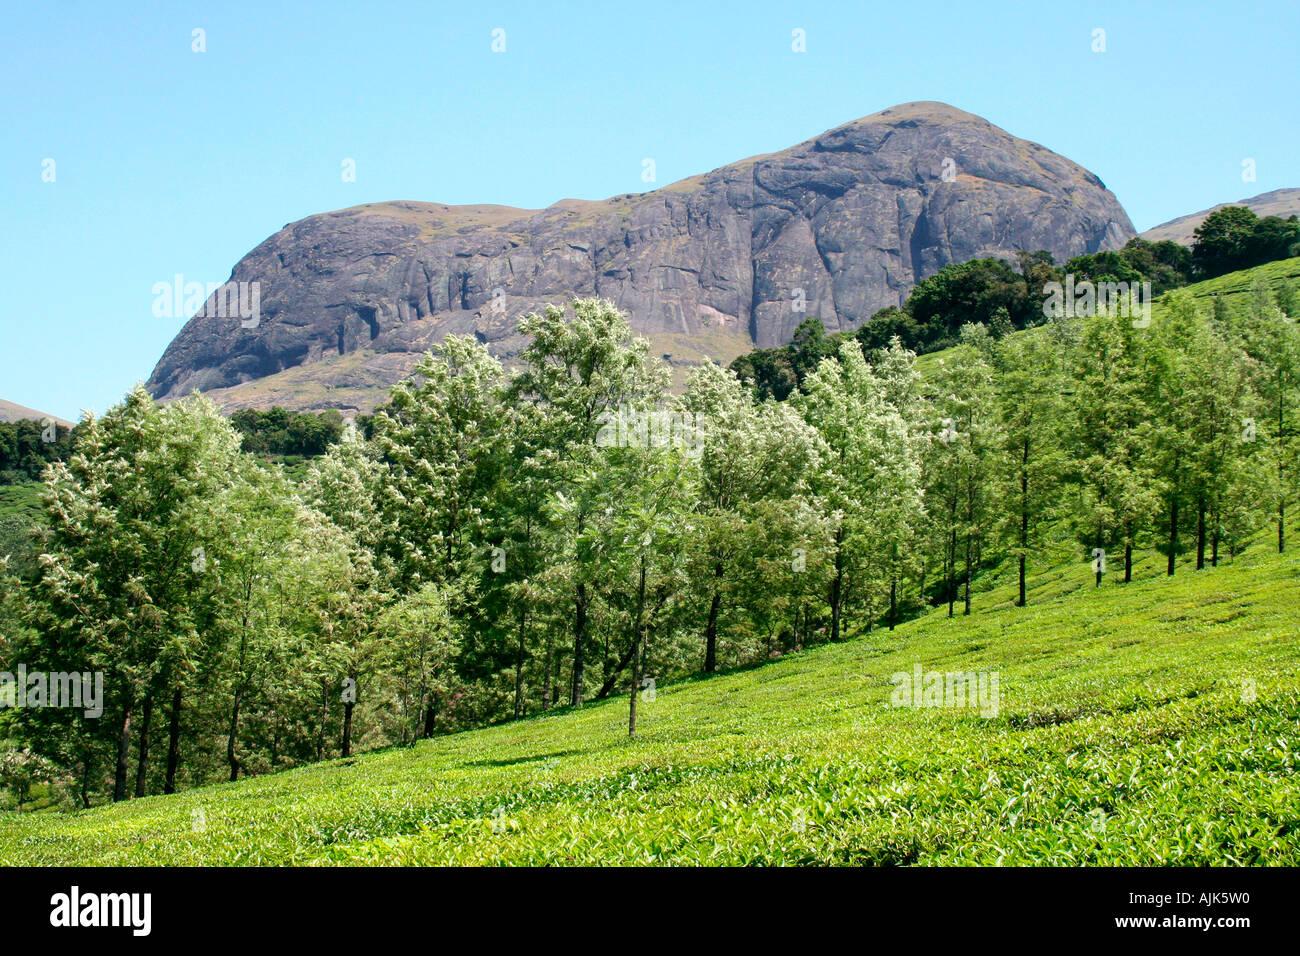 The famous Munnar tea estate of the Nilgiri hills, Kerala - Stock Image